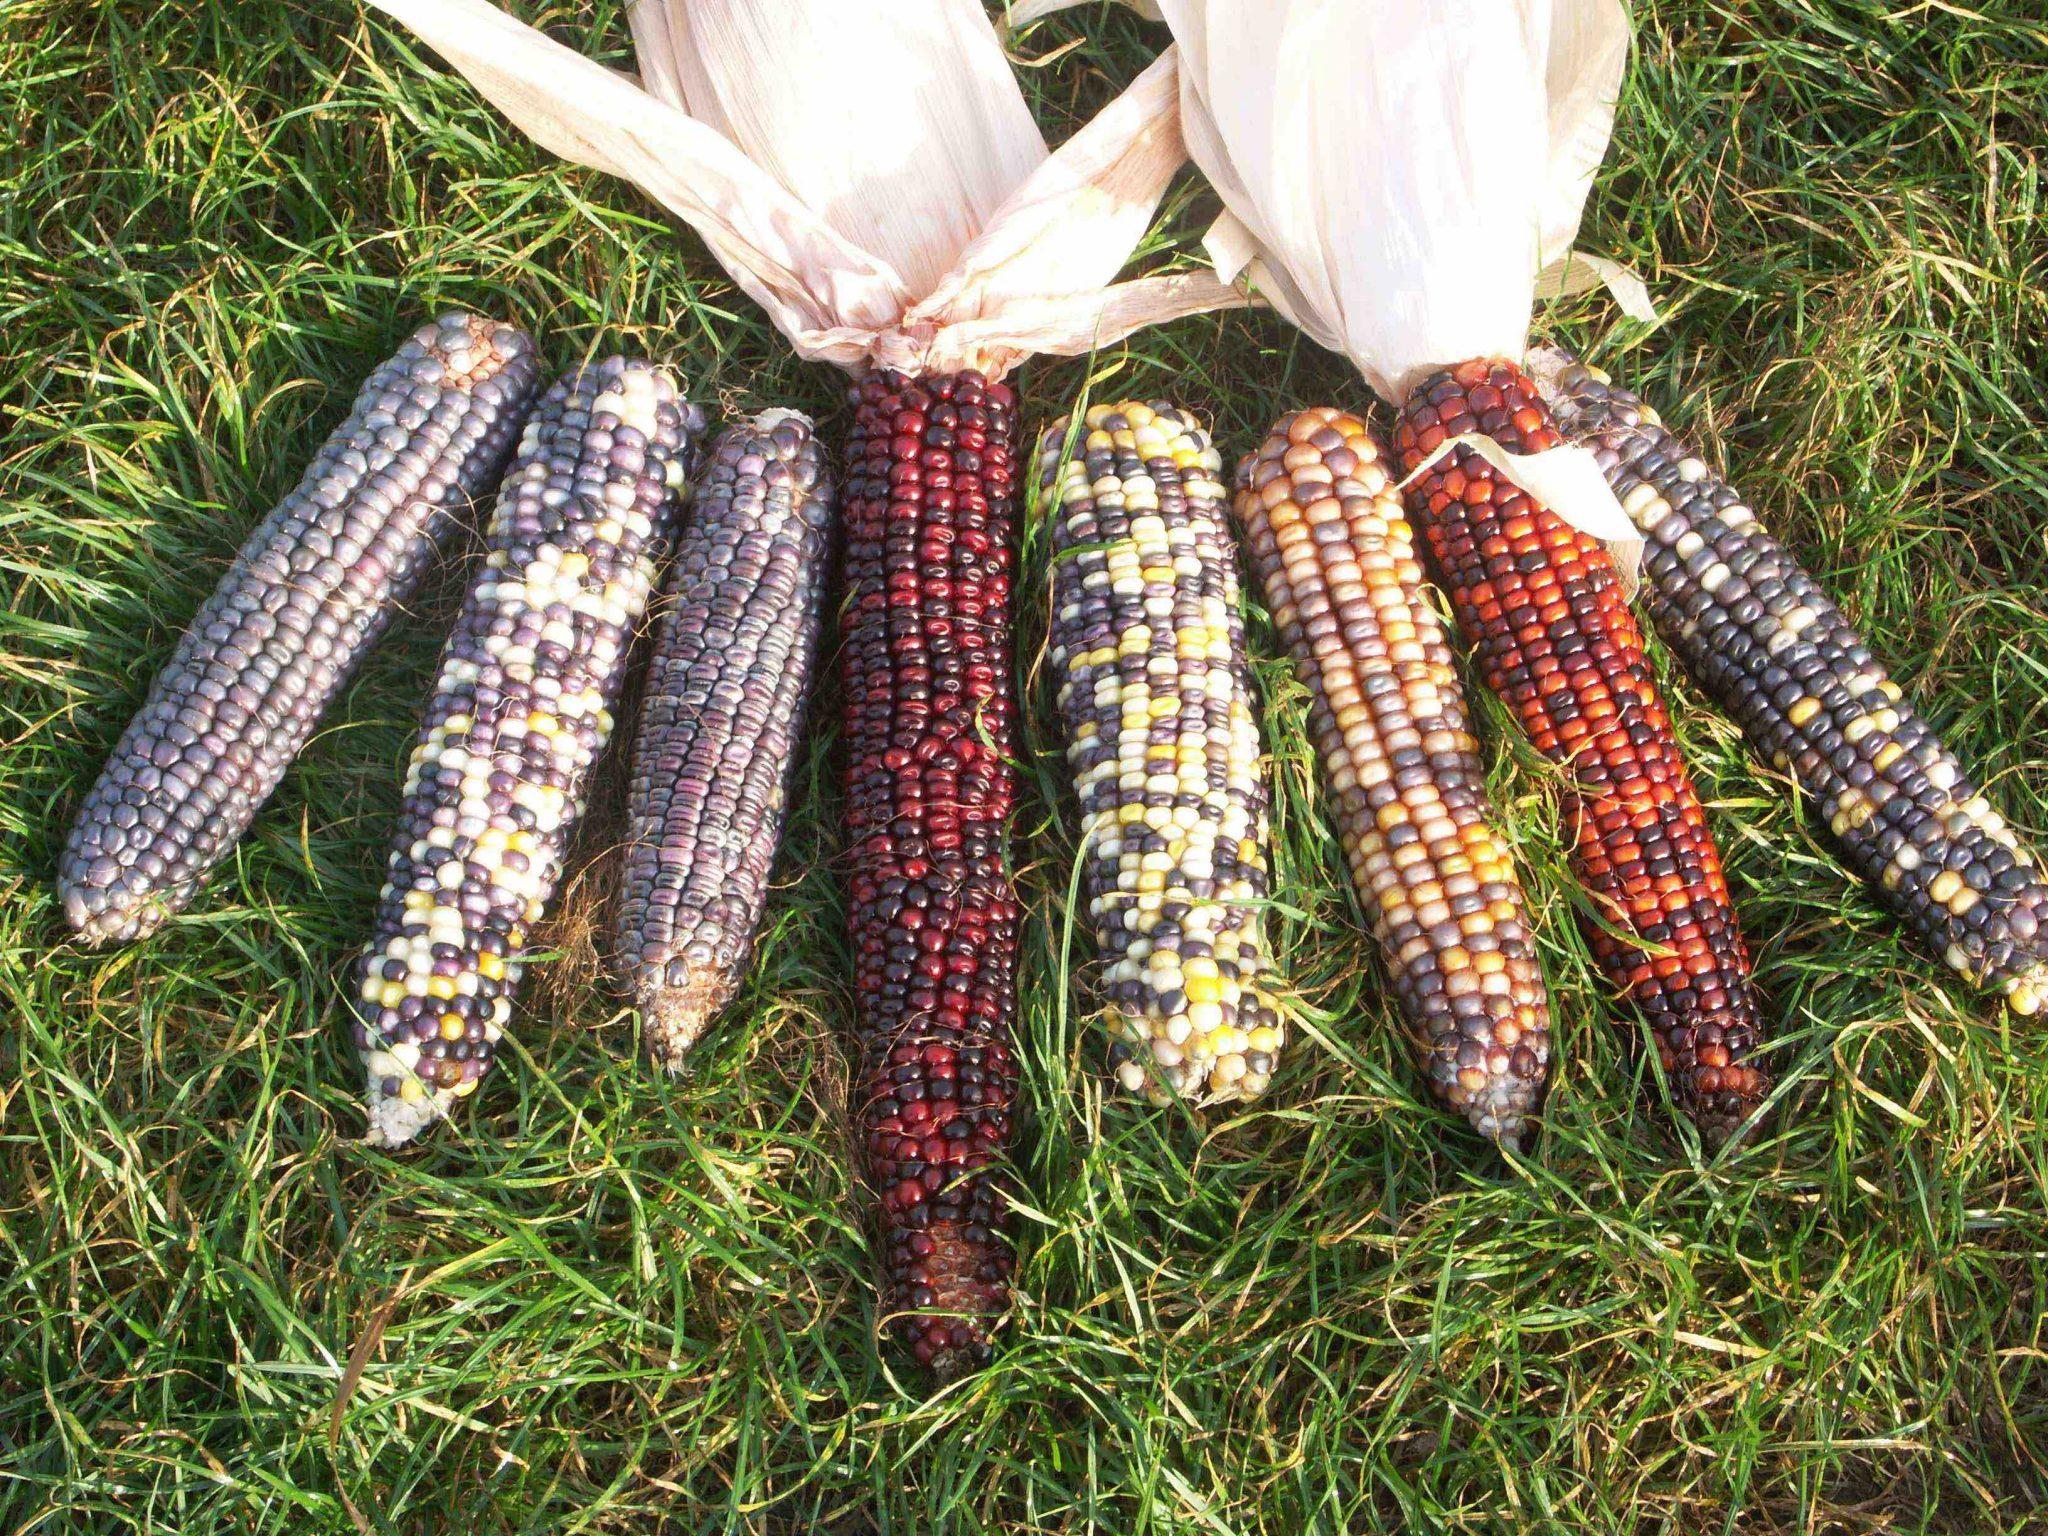 GMOs gene editing biodiversity mais corn